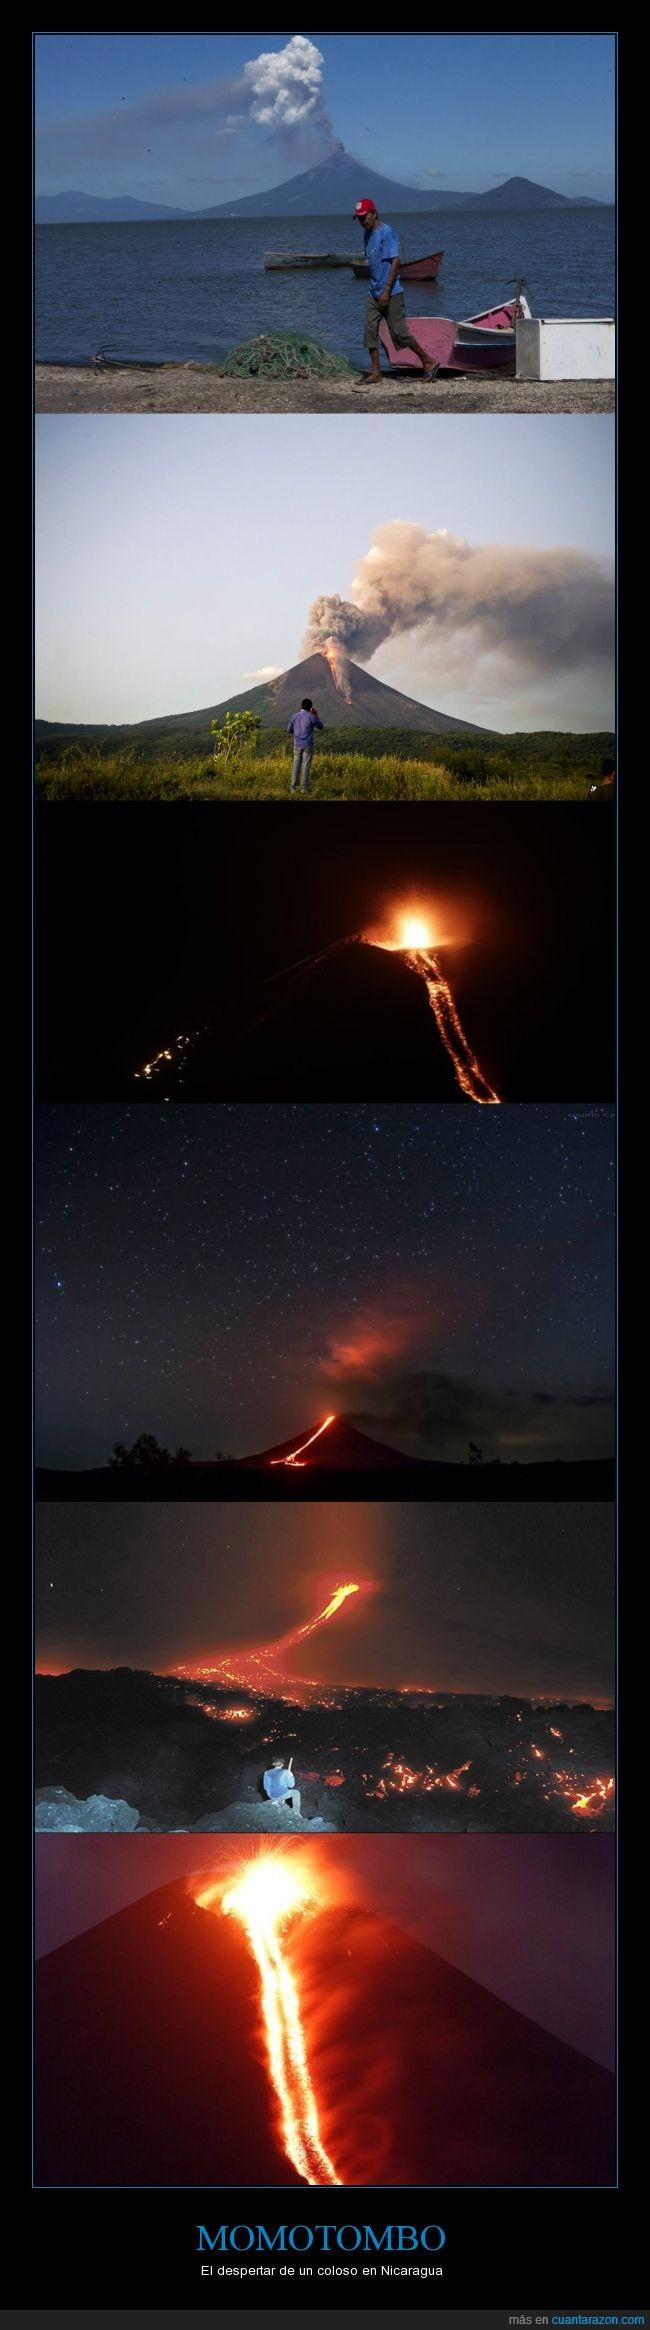 110 años dormido,aprovechar para mandar algunos politicos ahi,erupcion,nicaragua,volcan